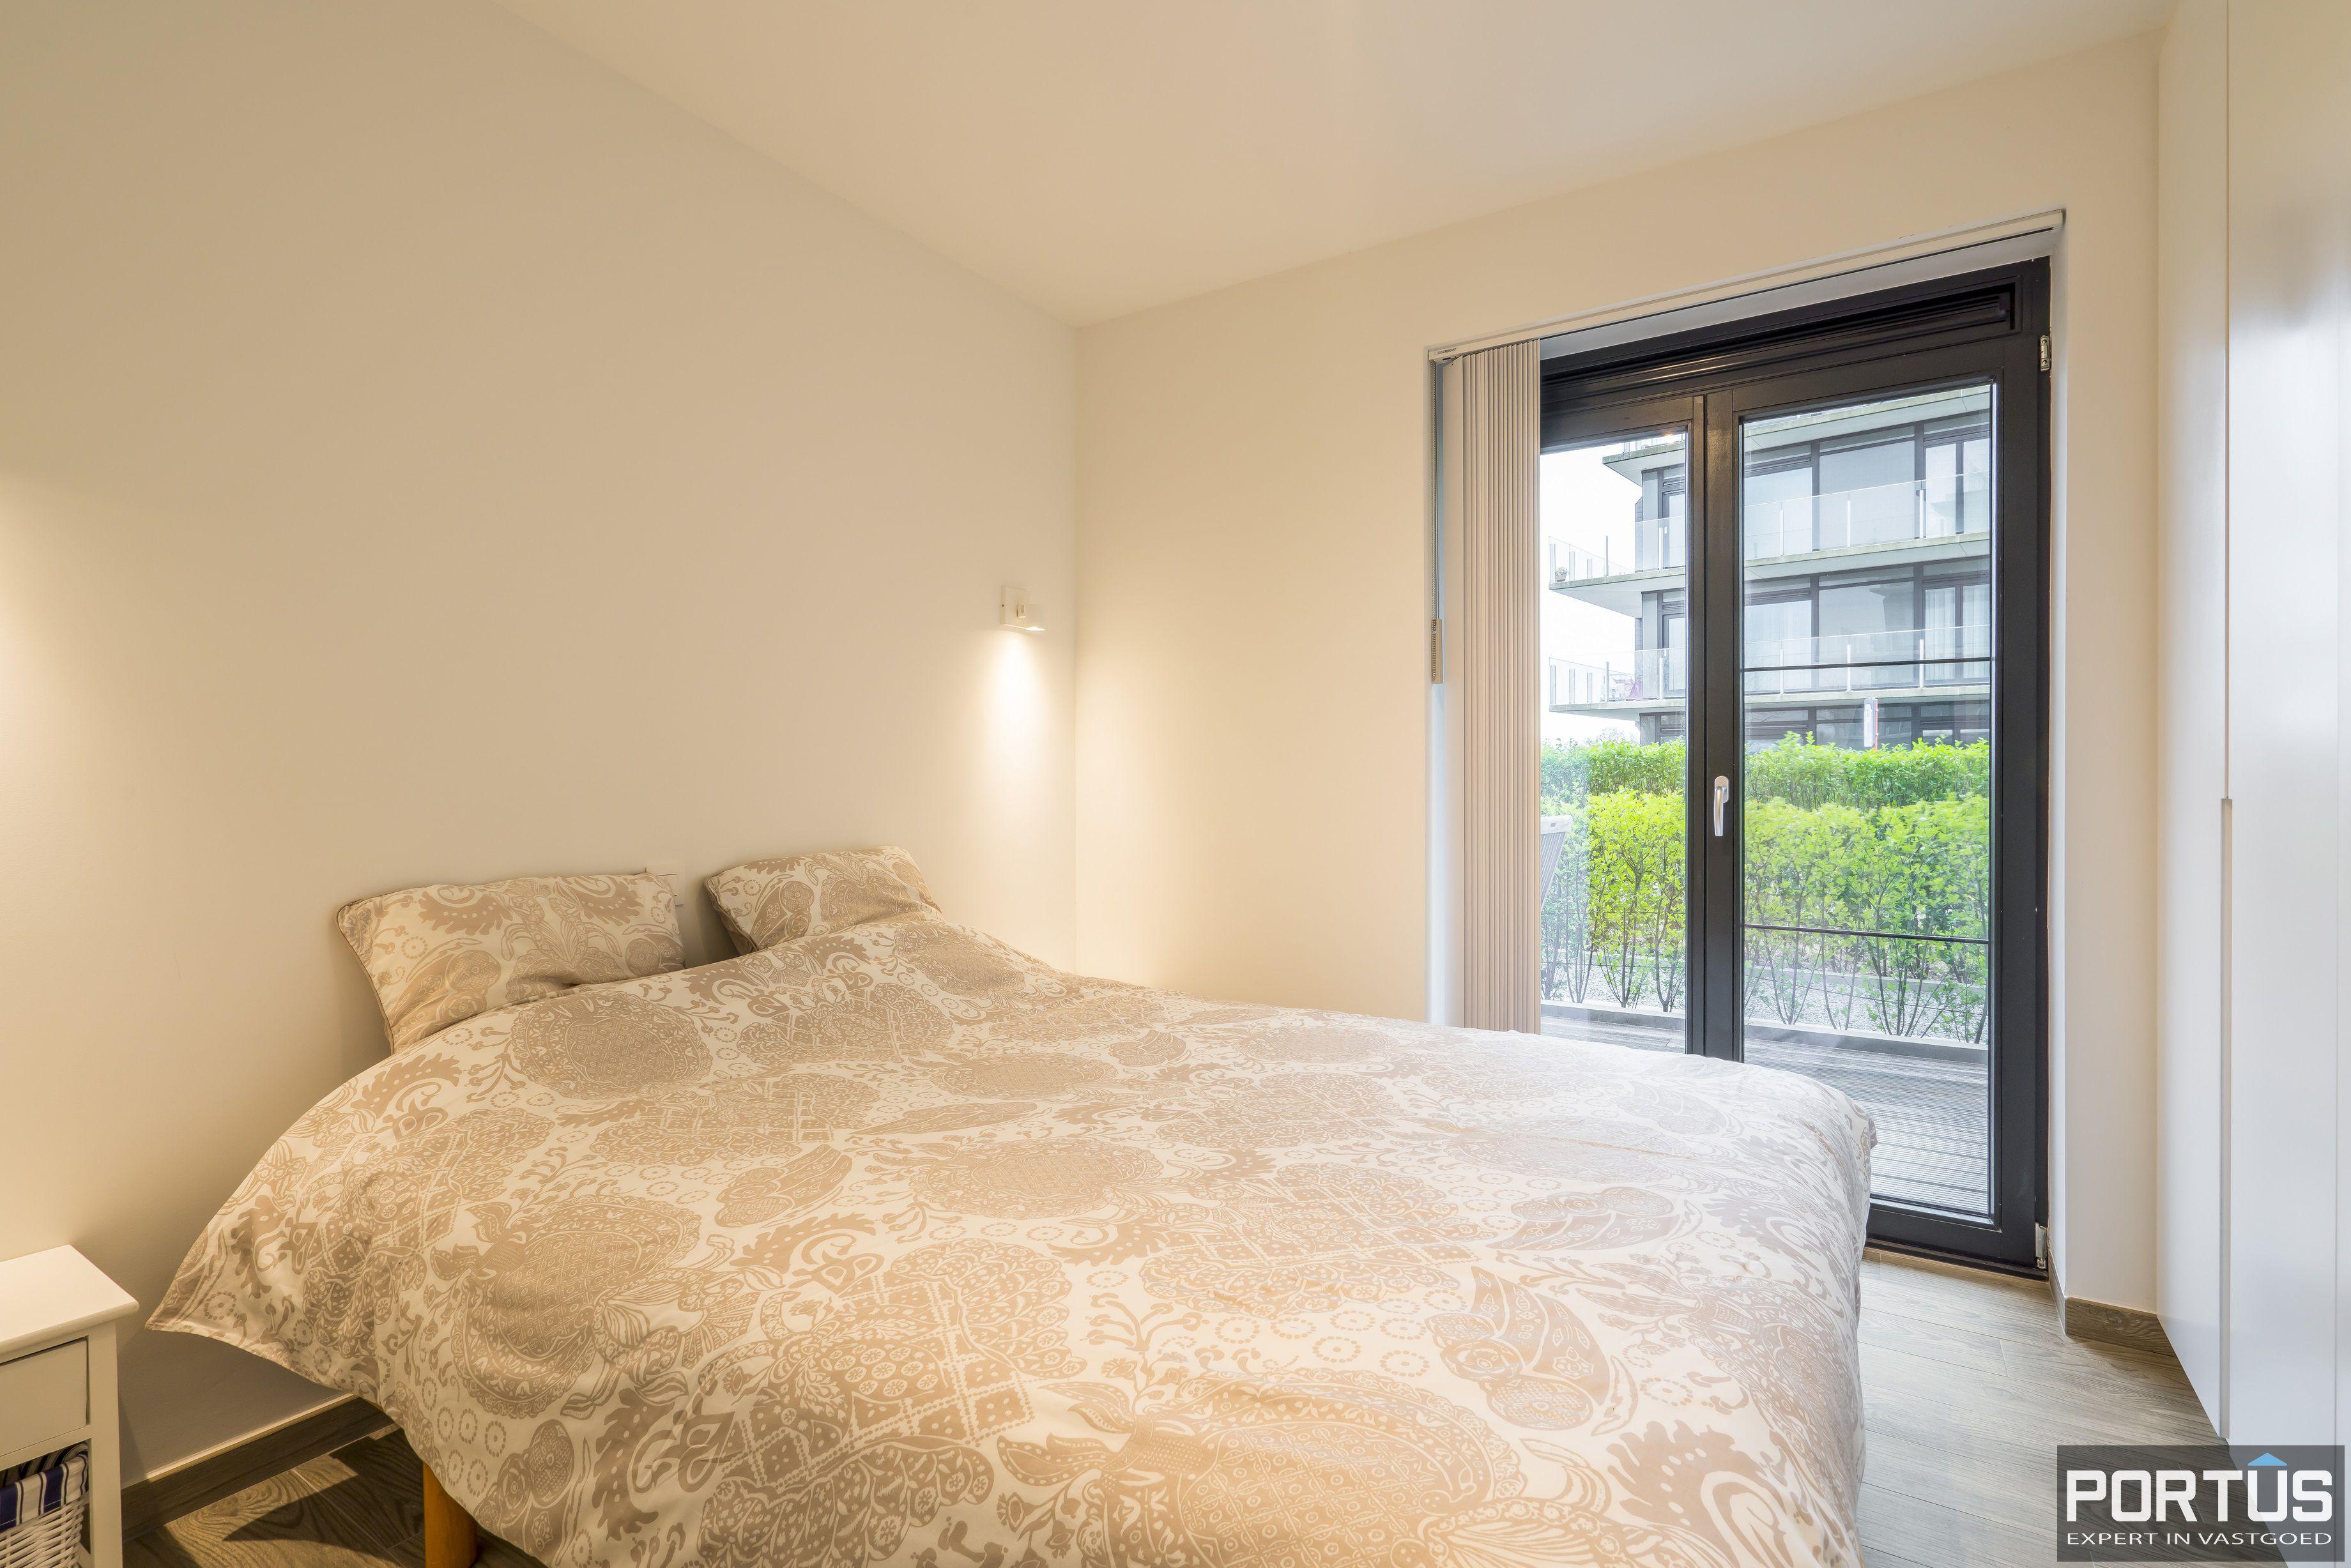 Appartement te koop met 2 slaapkamers in Residentie Waterfront te Nieuwpoort - 11867